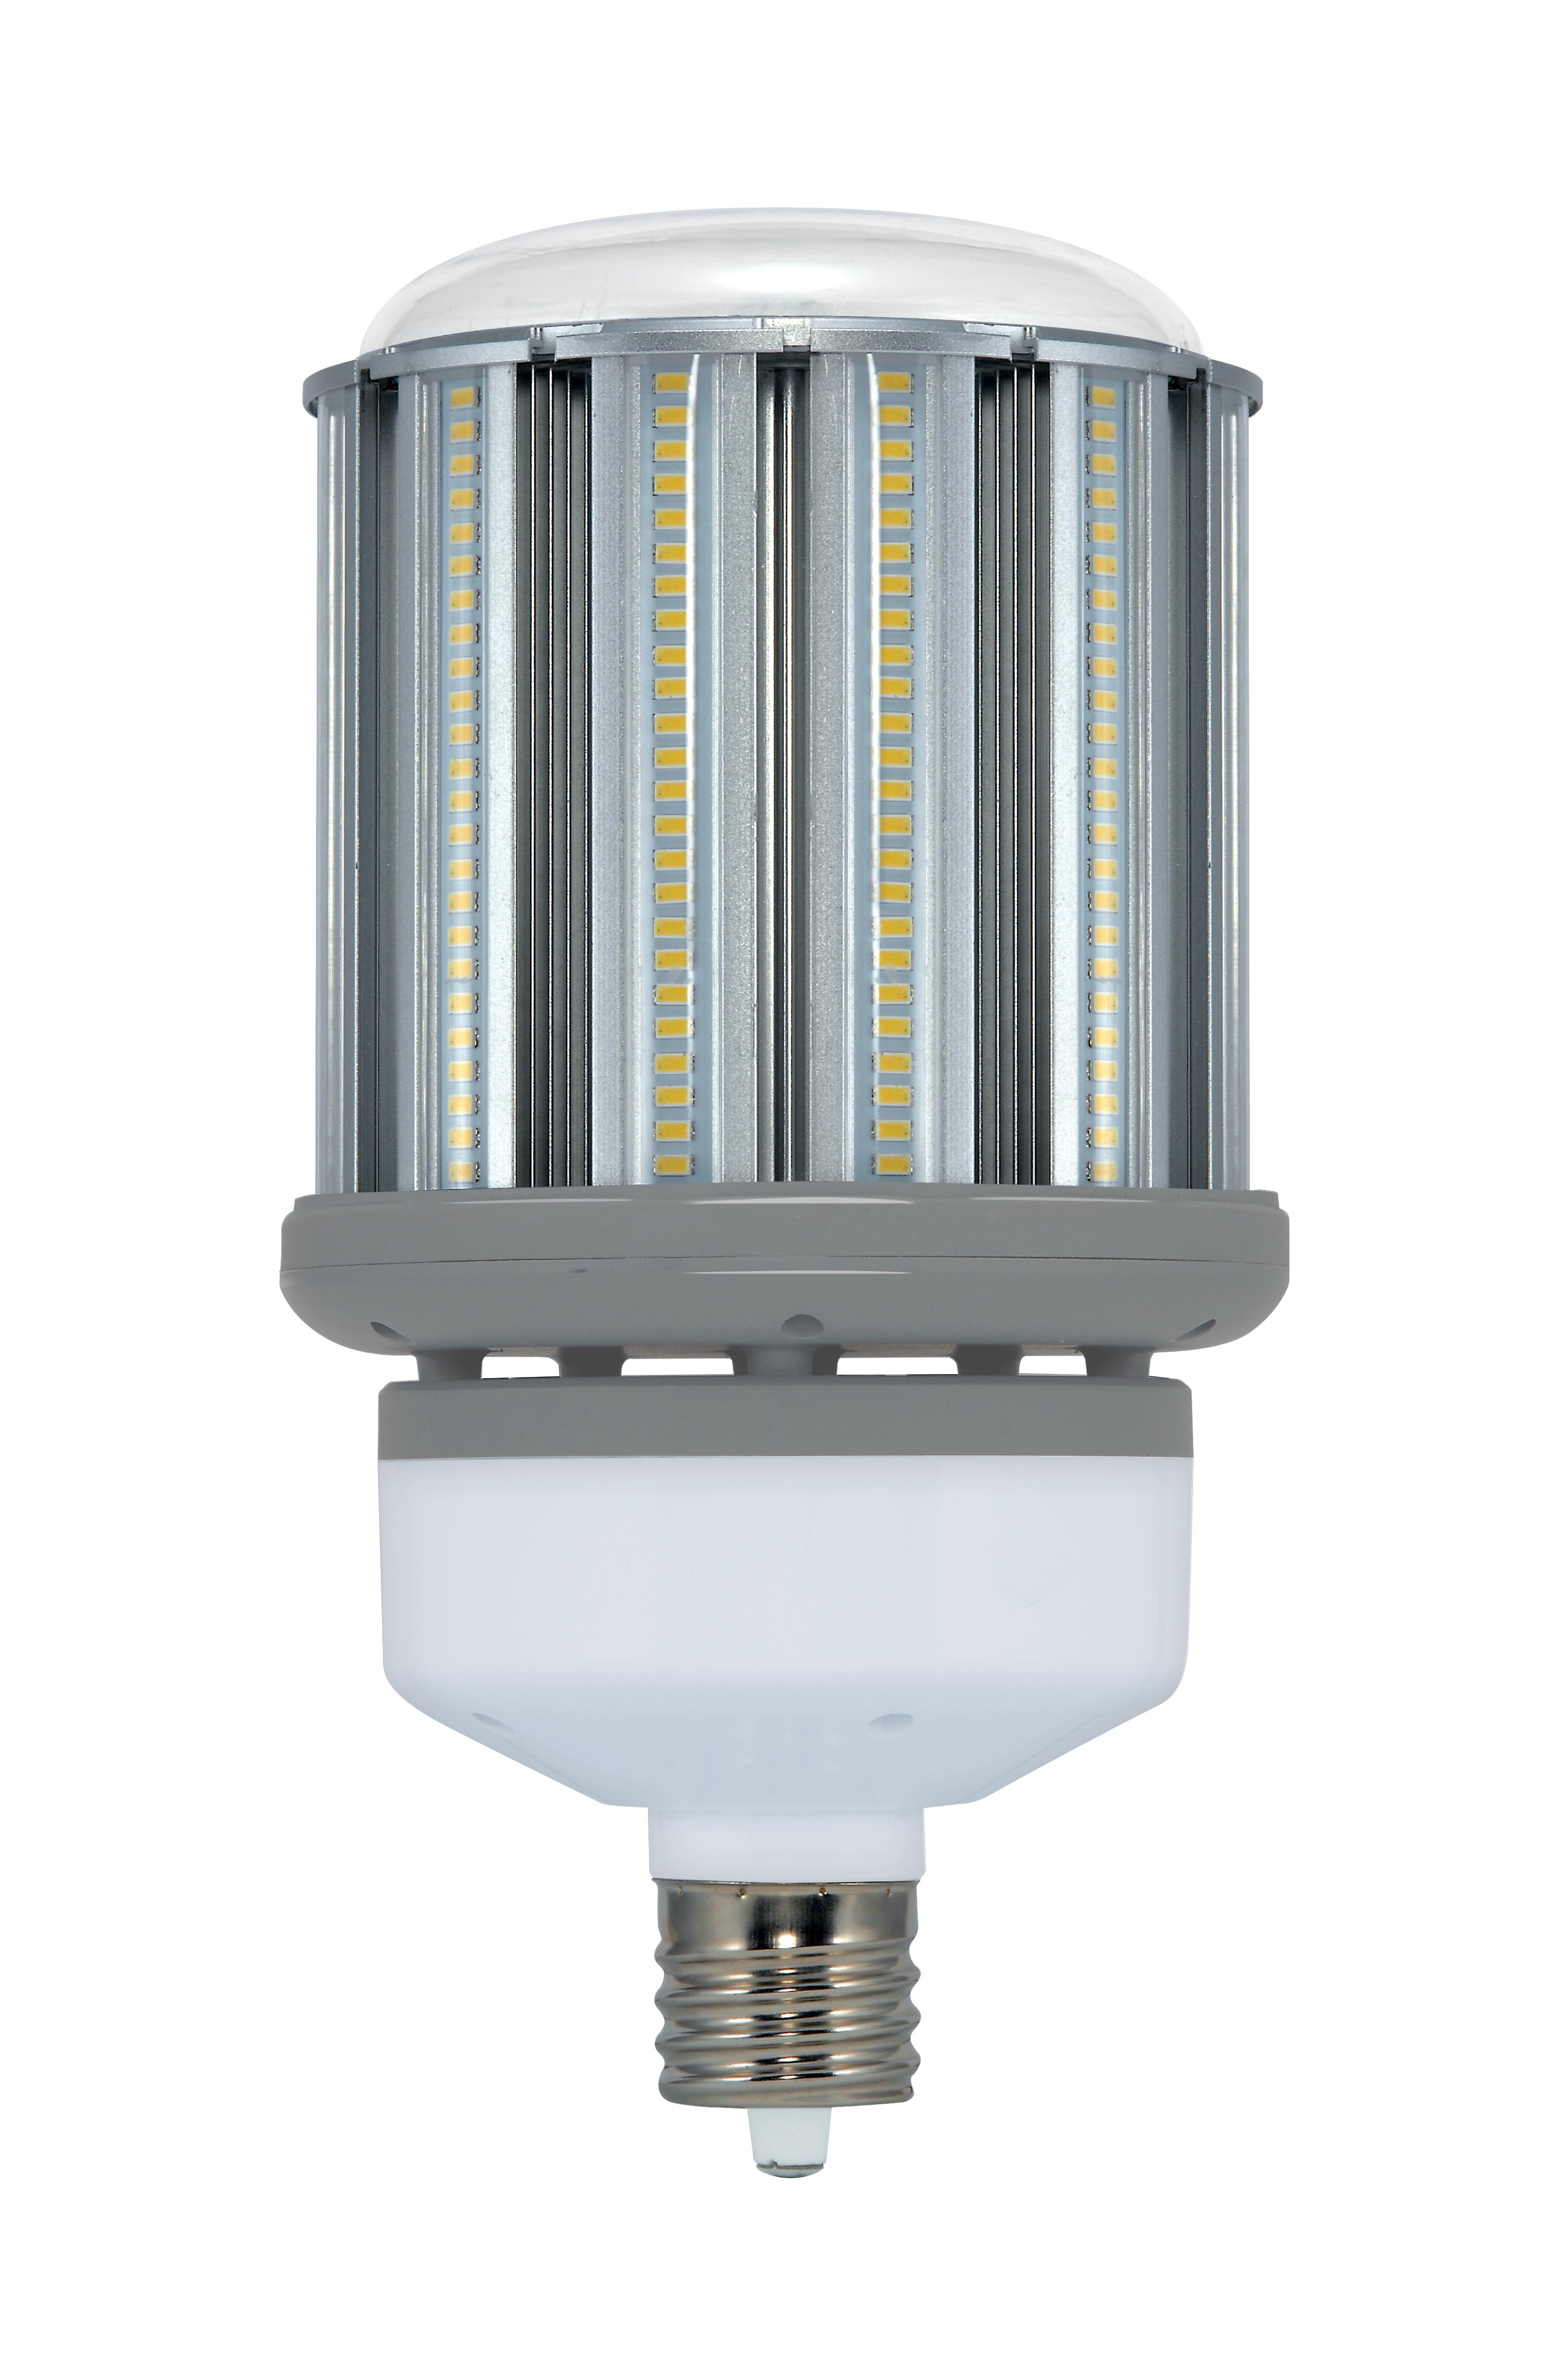 Satco,S9397,SATCO® Hi-Pro Non-Dimmable LED Retrofit, LED Lamp, 100 to 277 VAC